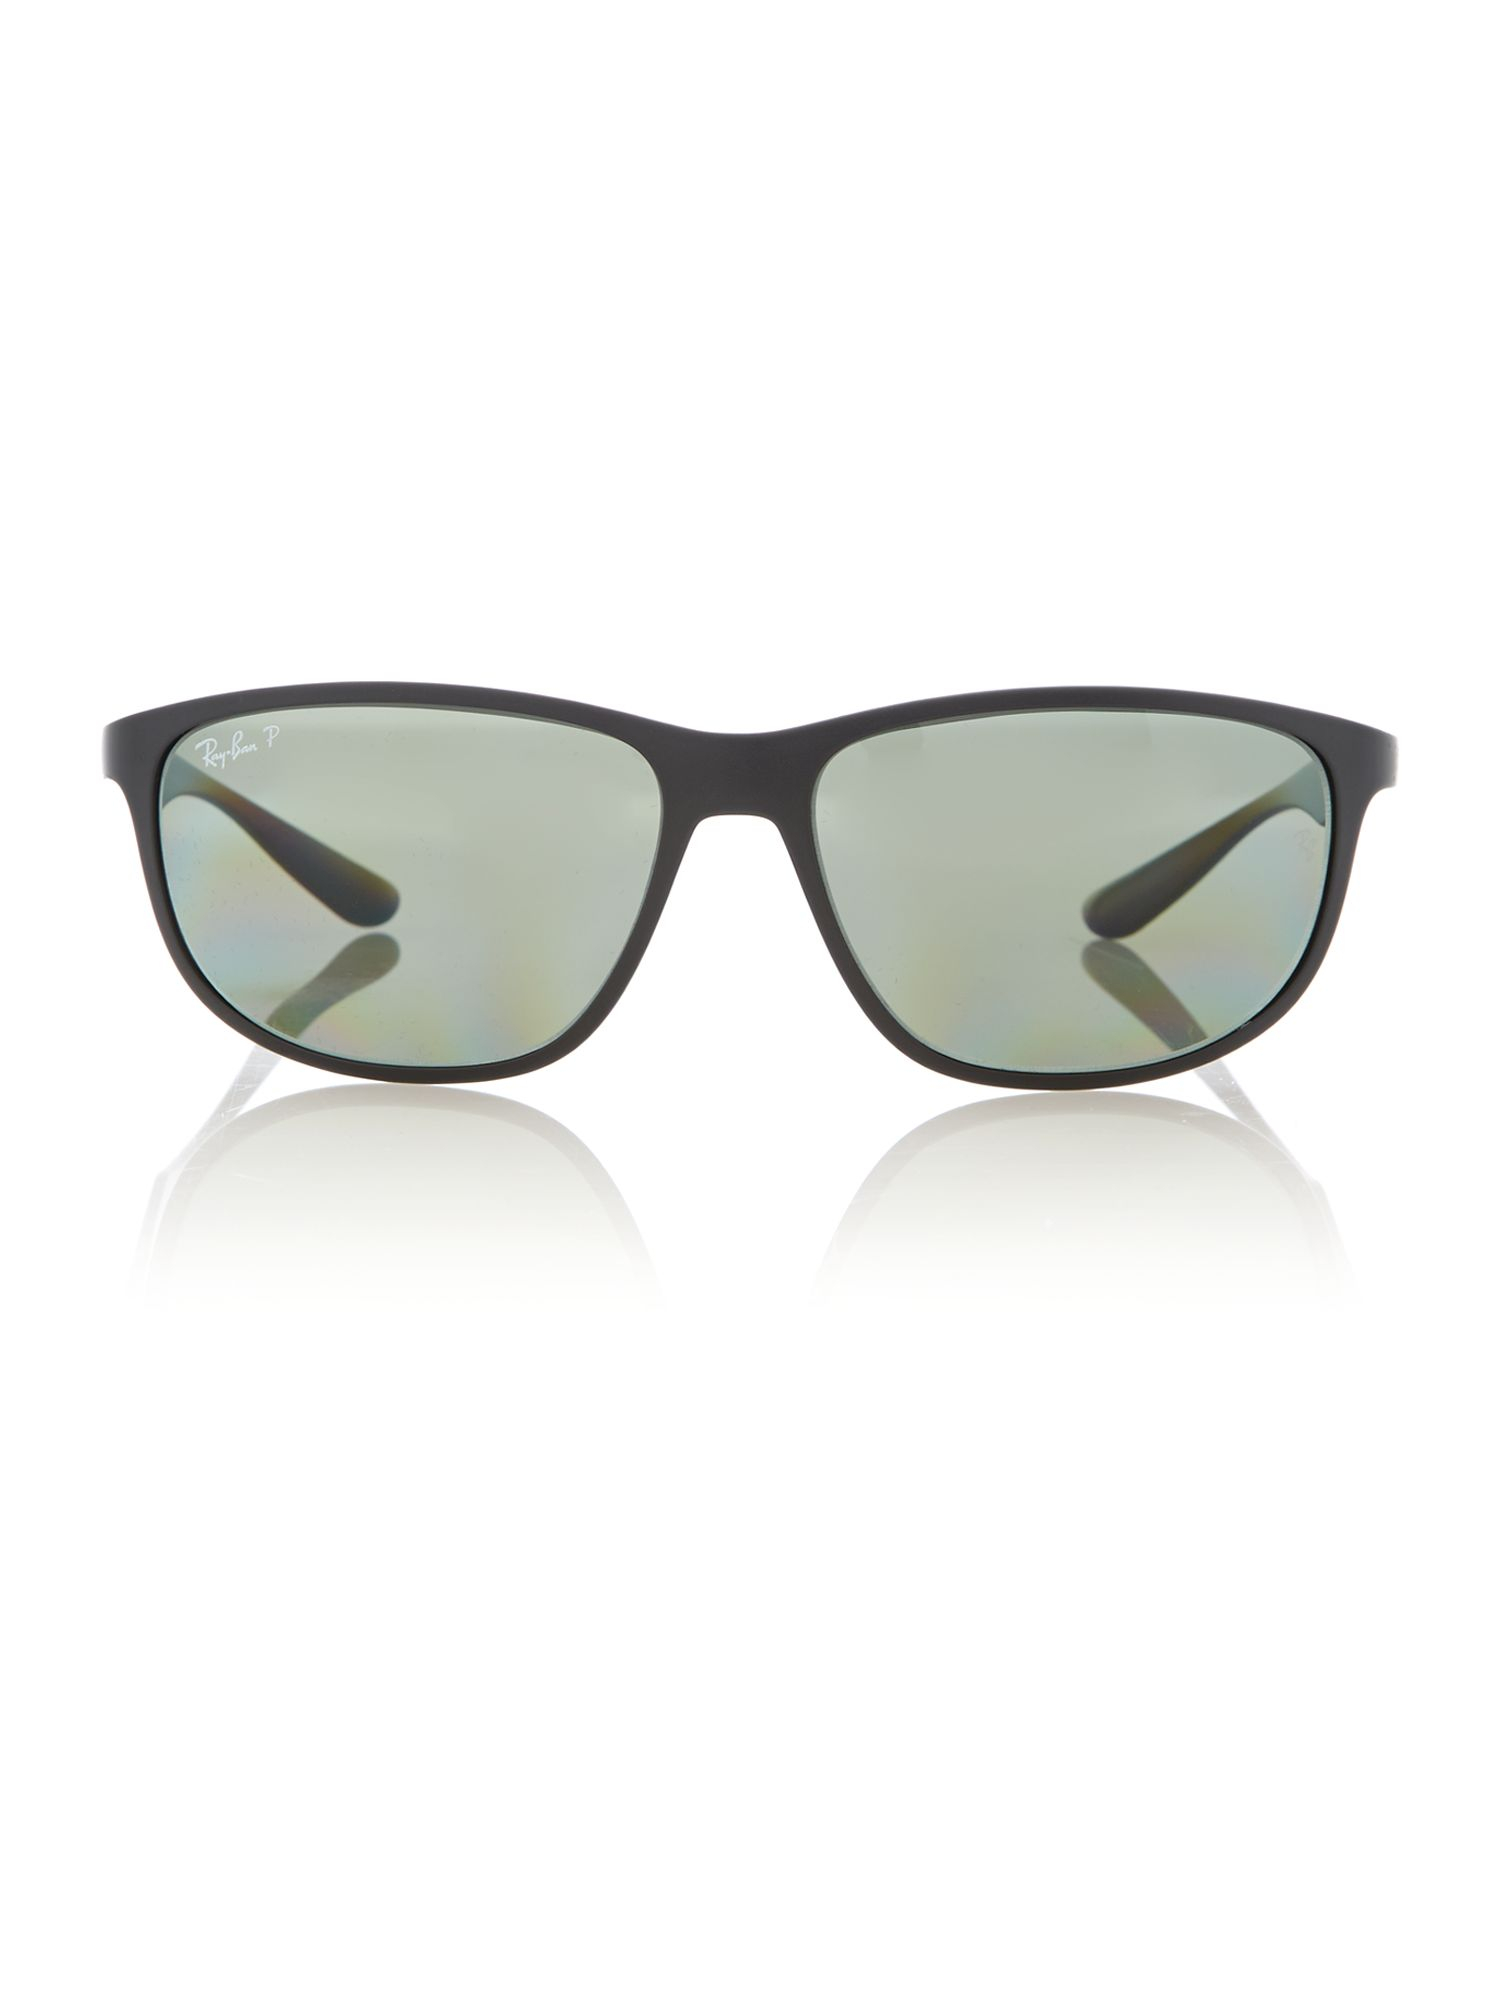 db87dd1078 Cheap Sunglasses Ray Ban Rb3478 « Heritage Malta